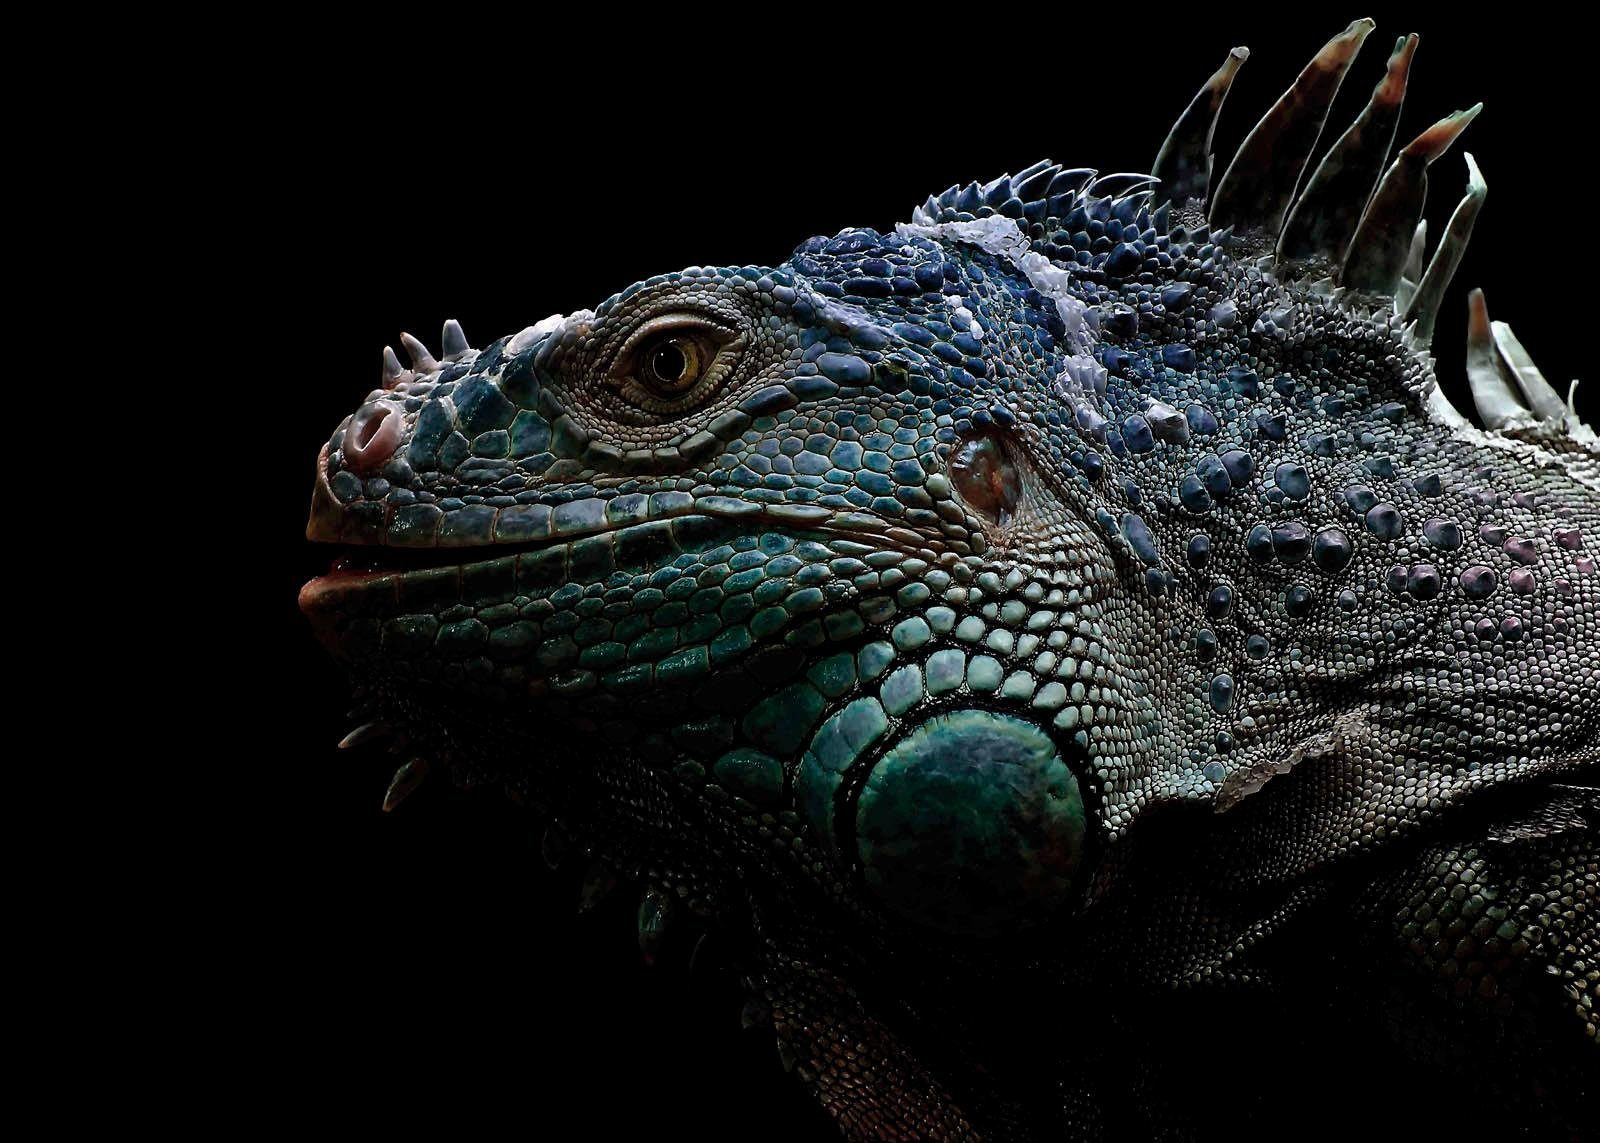 Alu-Dibond-Druck »Iguana«, Tiermotiv, 140/100 cm